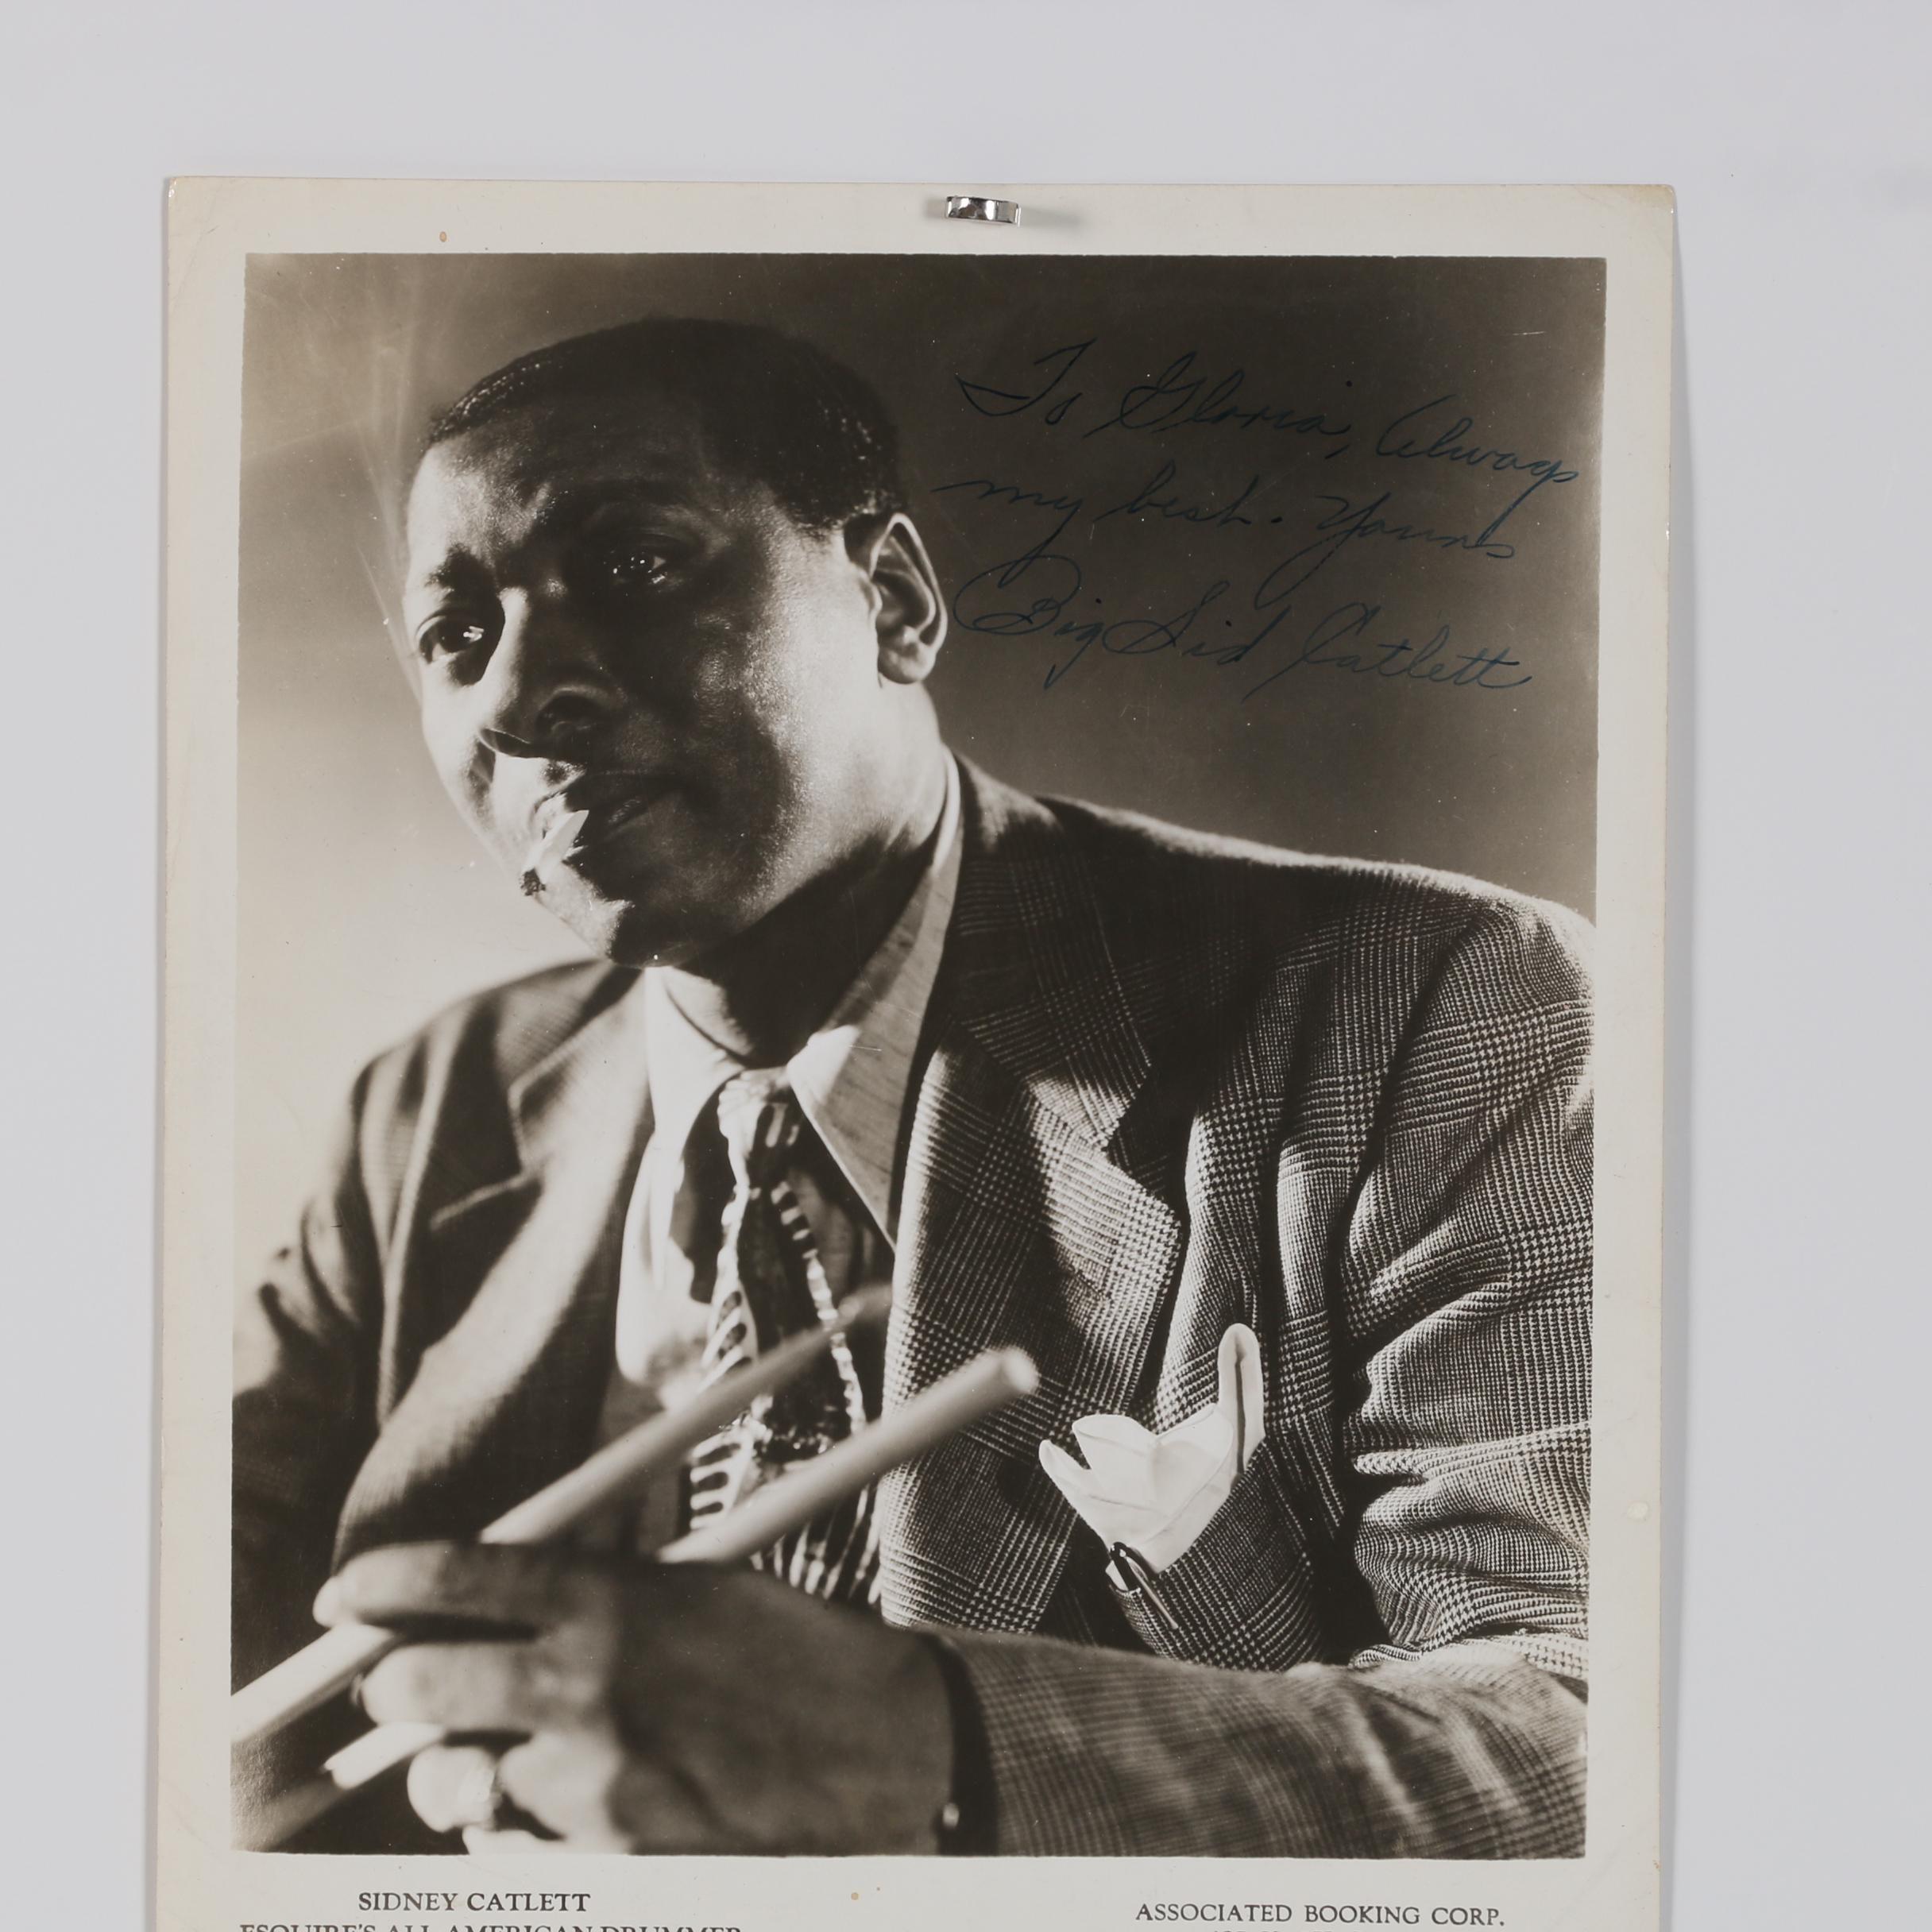 Autographed Sidney Catlett Silver Gelatin Photograph